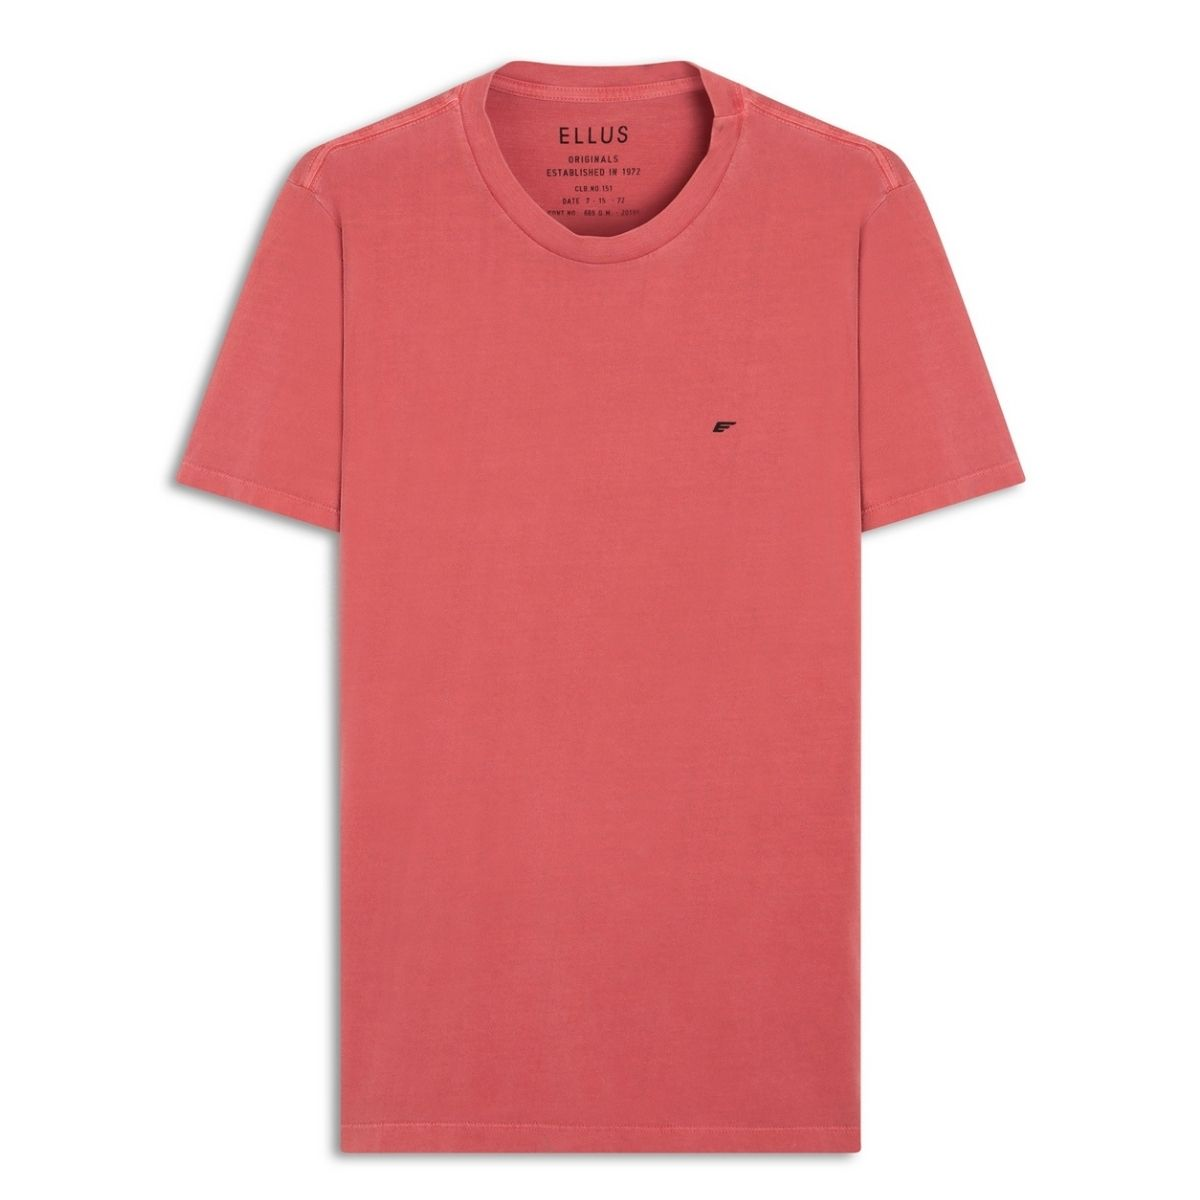 Camiseta Ellus Manga Curta Cotton Fine E Asa Classic  Clb.no.151